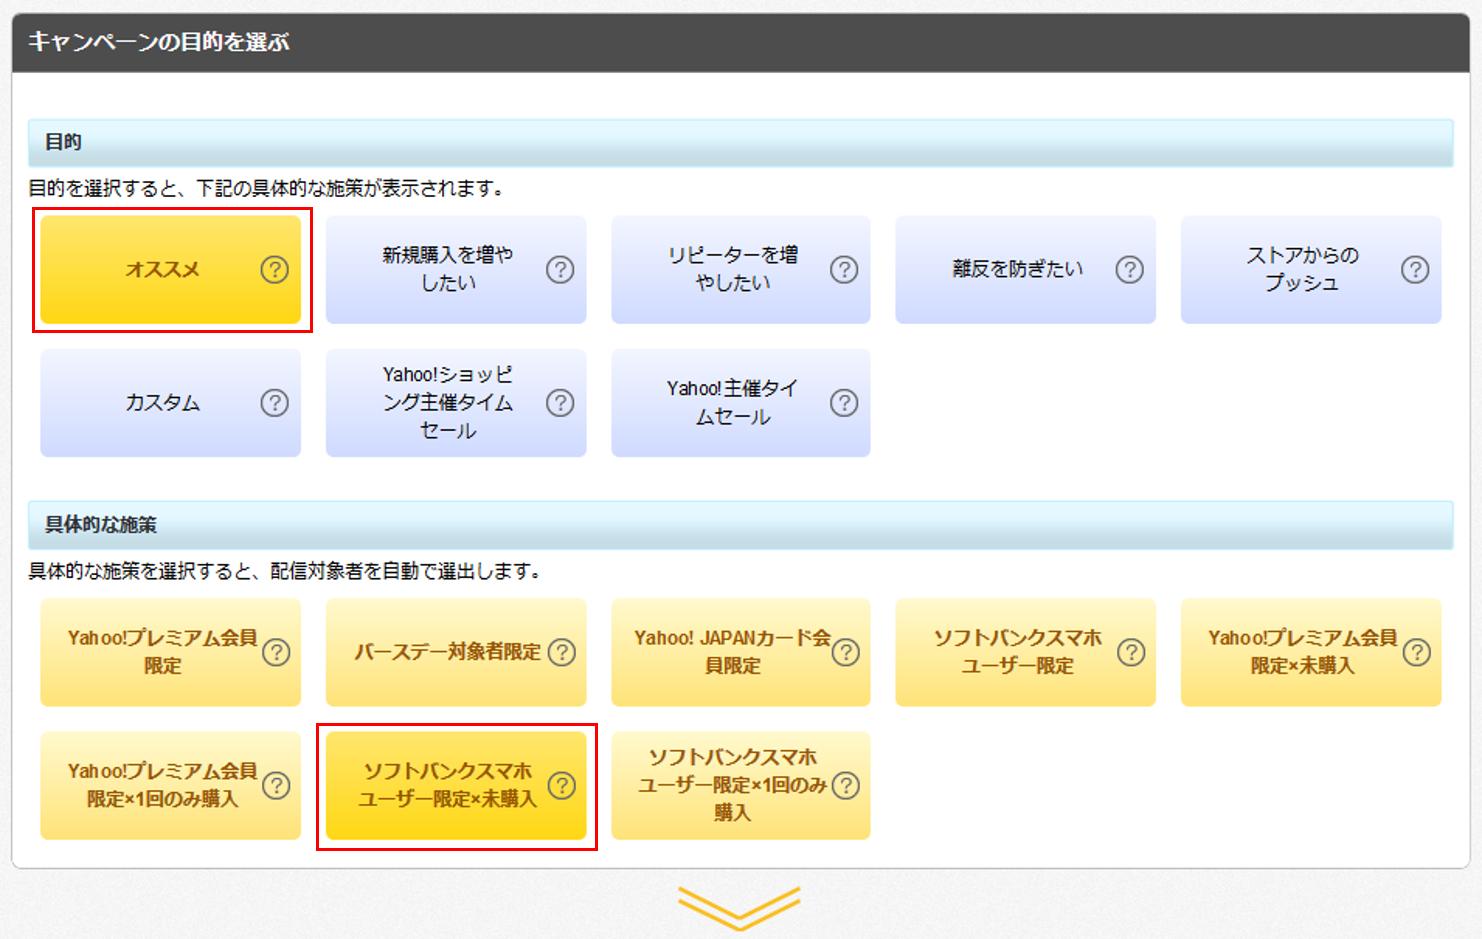 campaign-image-purpose-choose-softbank2